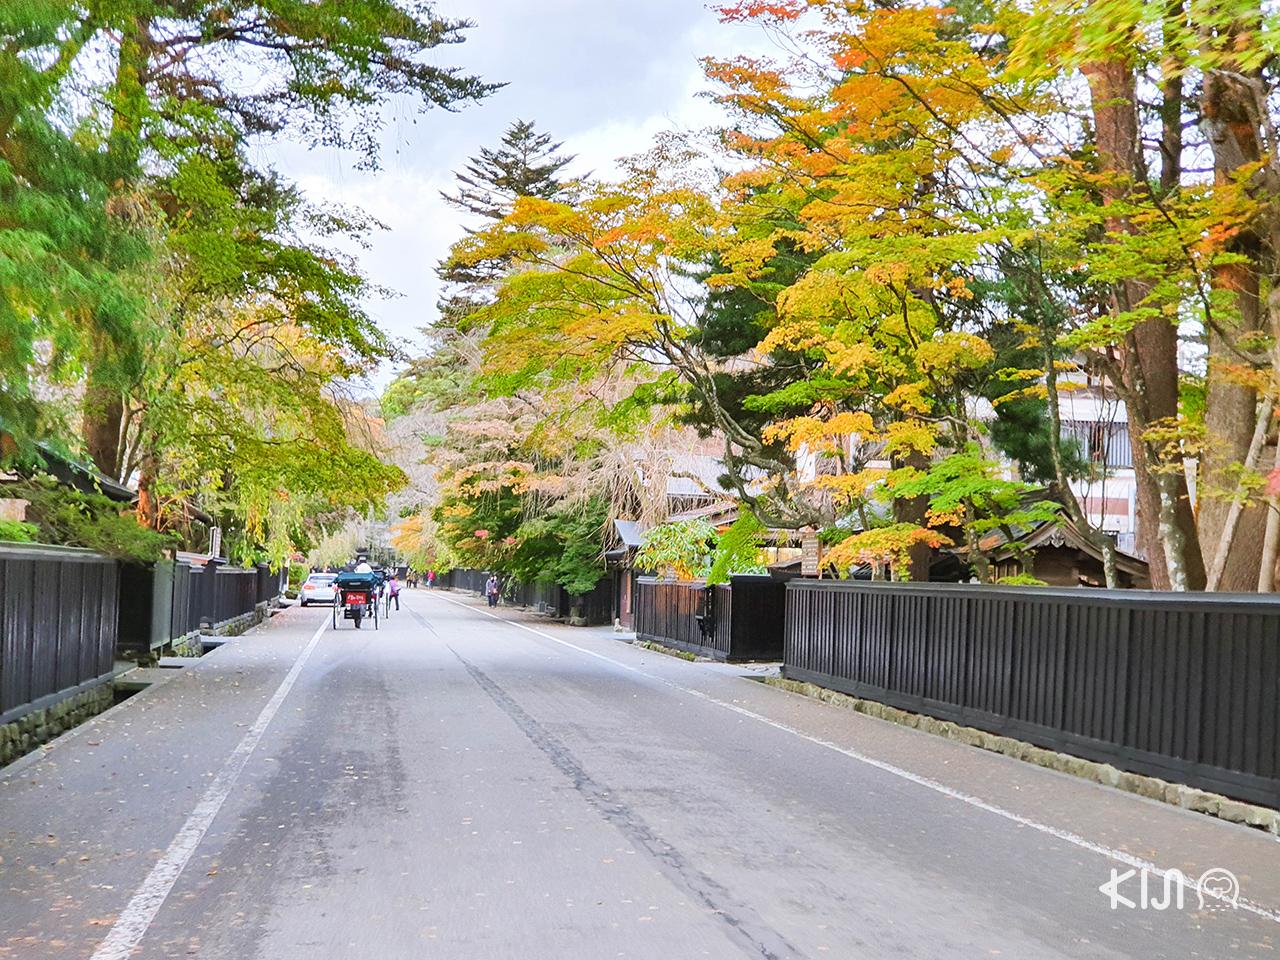 Kakunodate Bukeyashiki Street ฤดูใบไม้ร่วง ใบไม้เปลี่ยนสี อาคิตะ